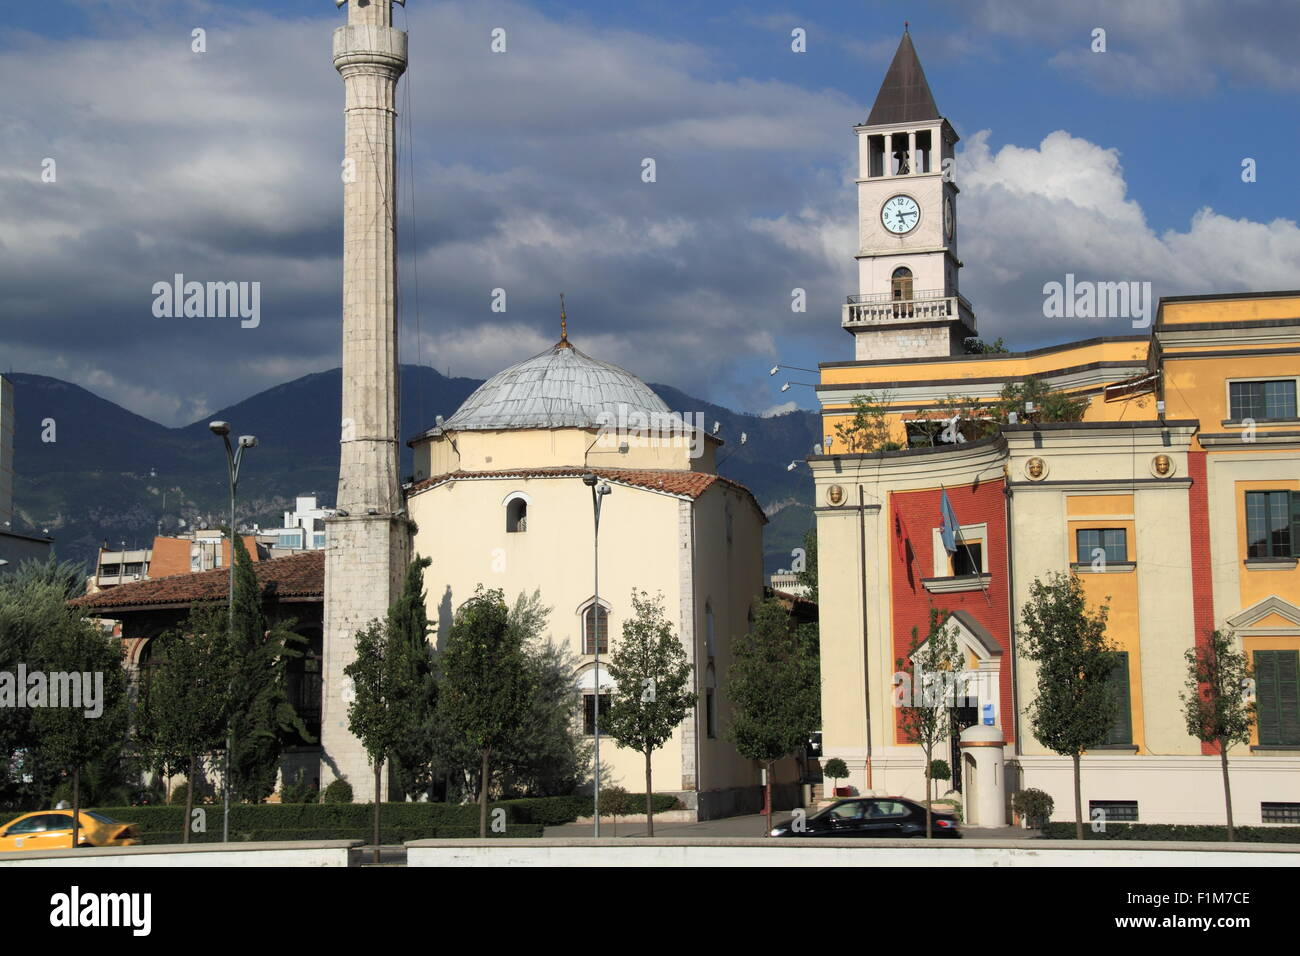 Et'hem Bey Mosque and City Hall with Clocktower behind, Skanderbeg Square, Tirana, Albania, Balkans, Europe - Stock Image